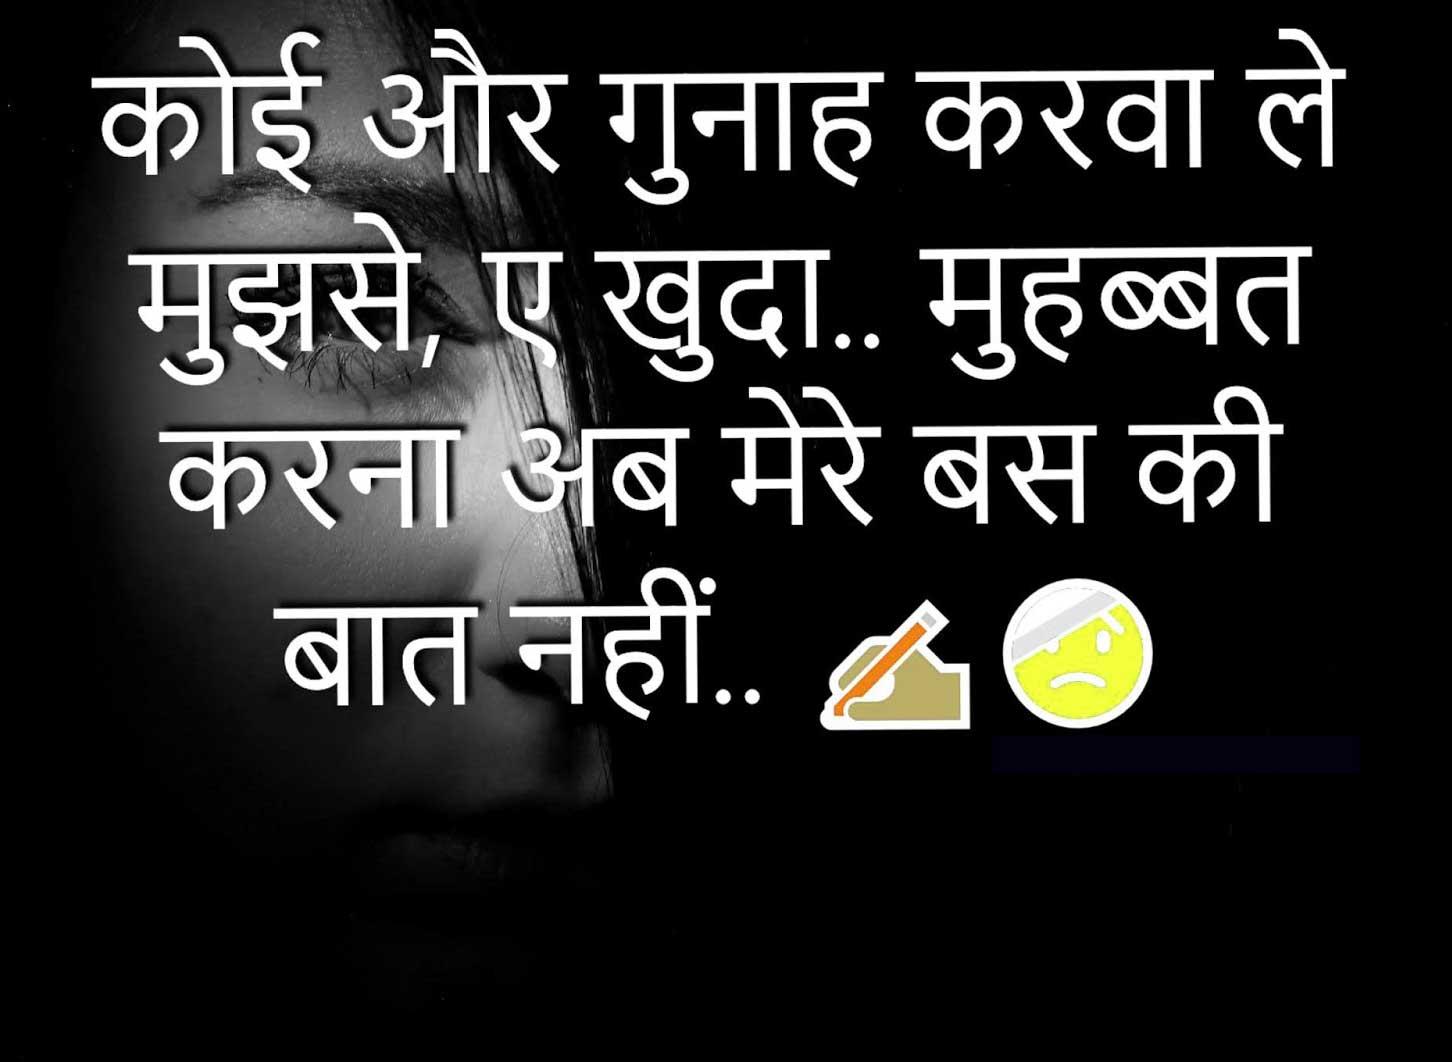 Hindi Sad Status Pics Wallpaper